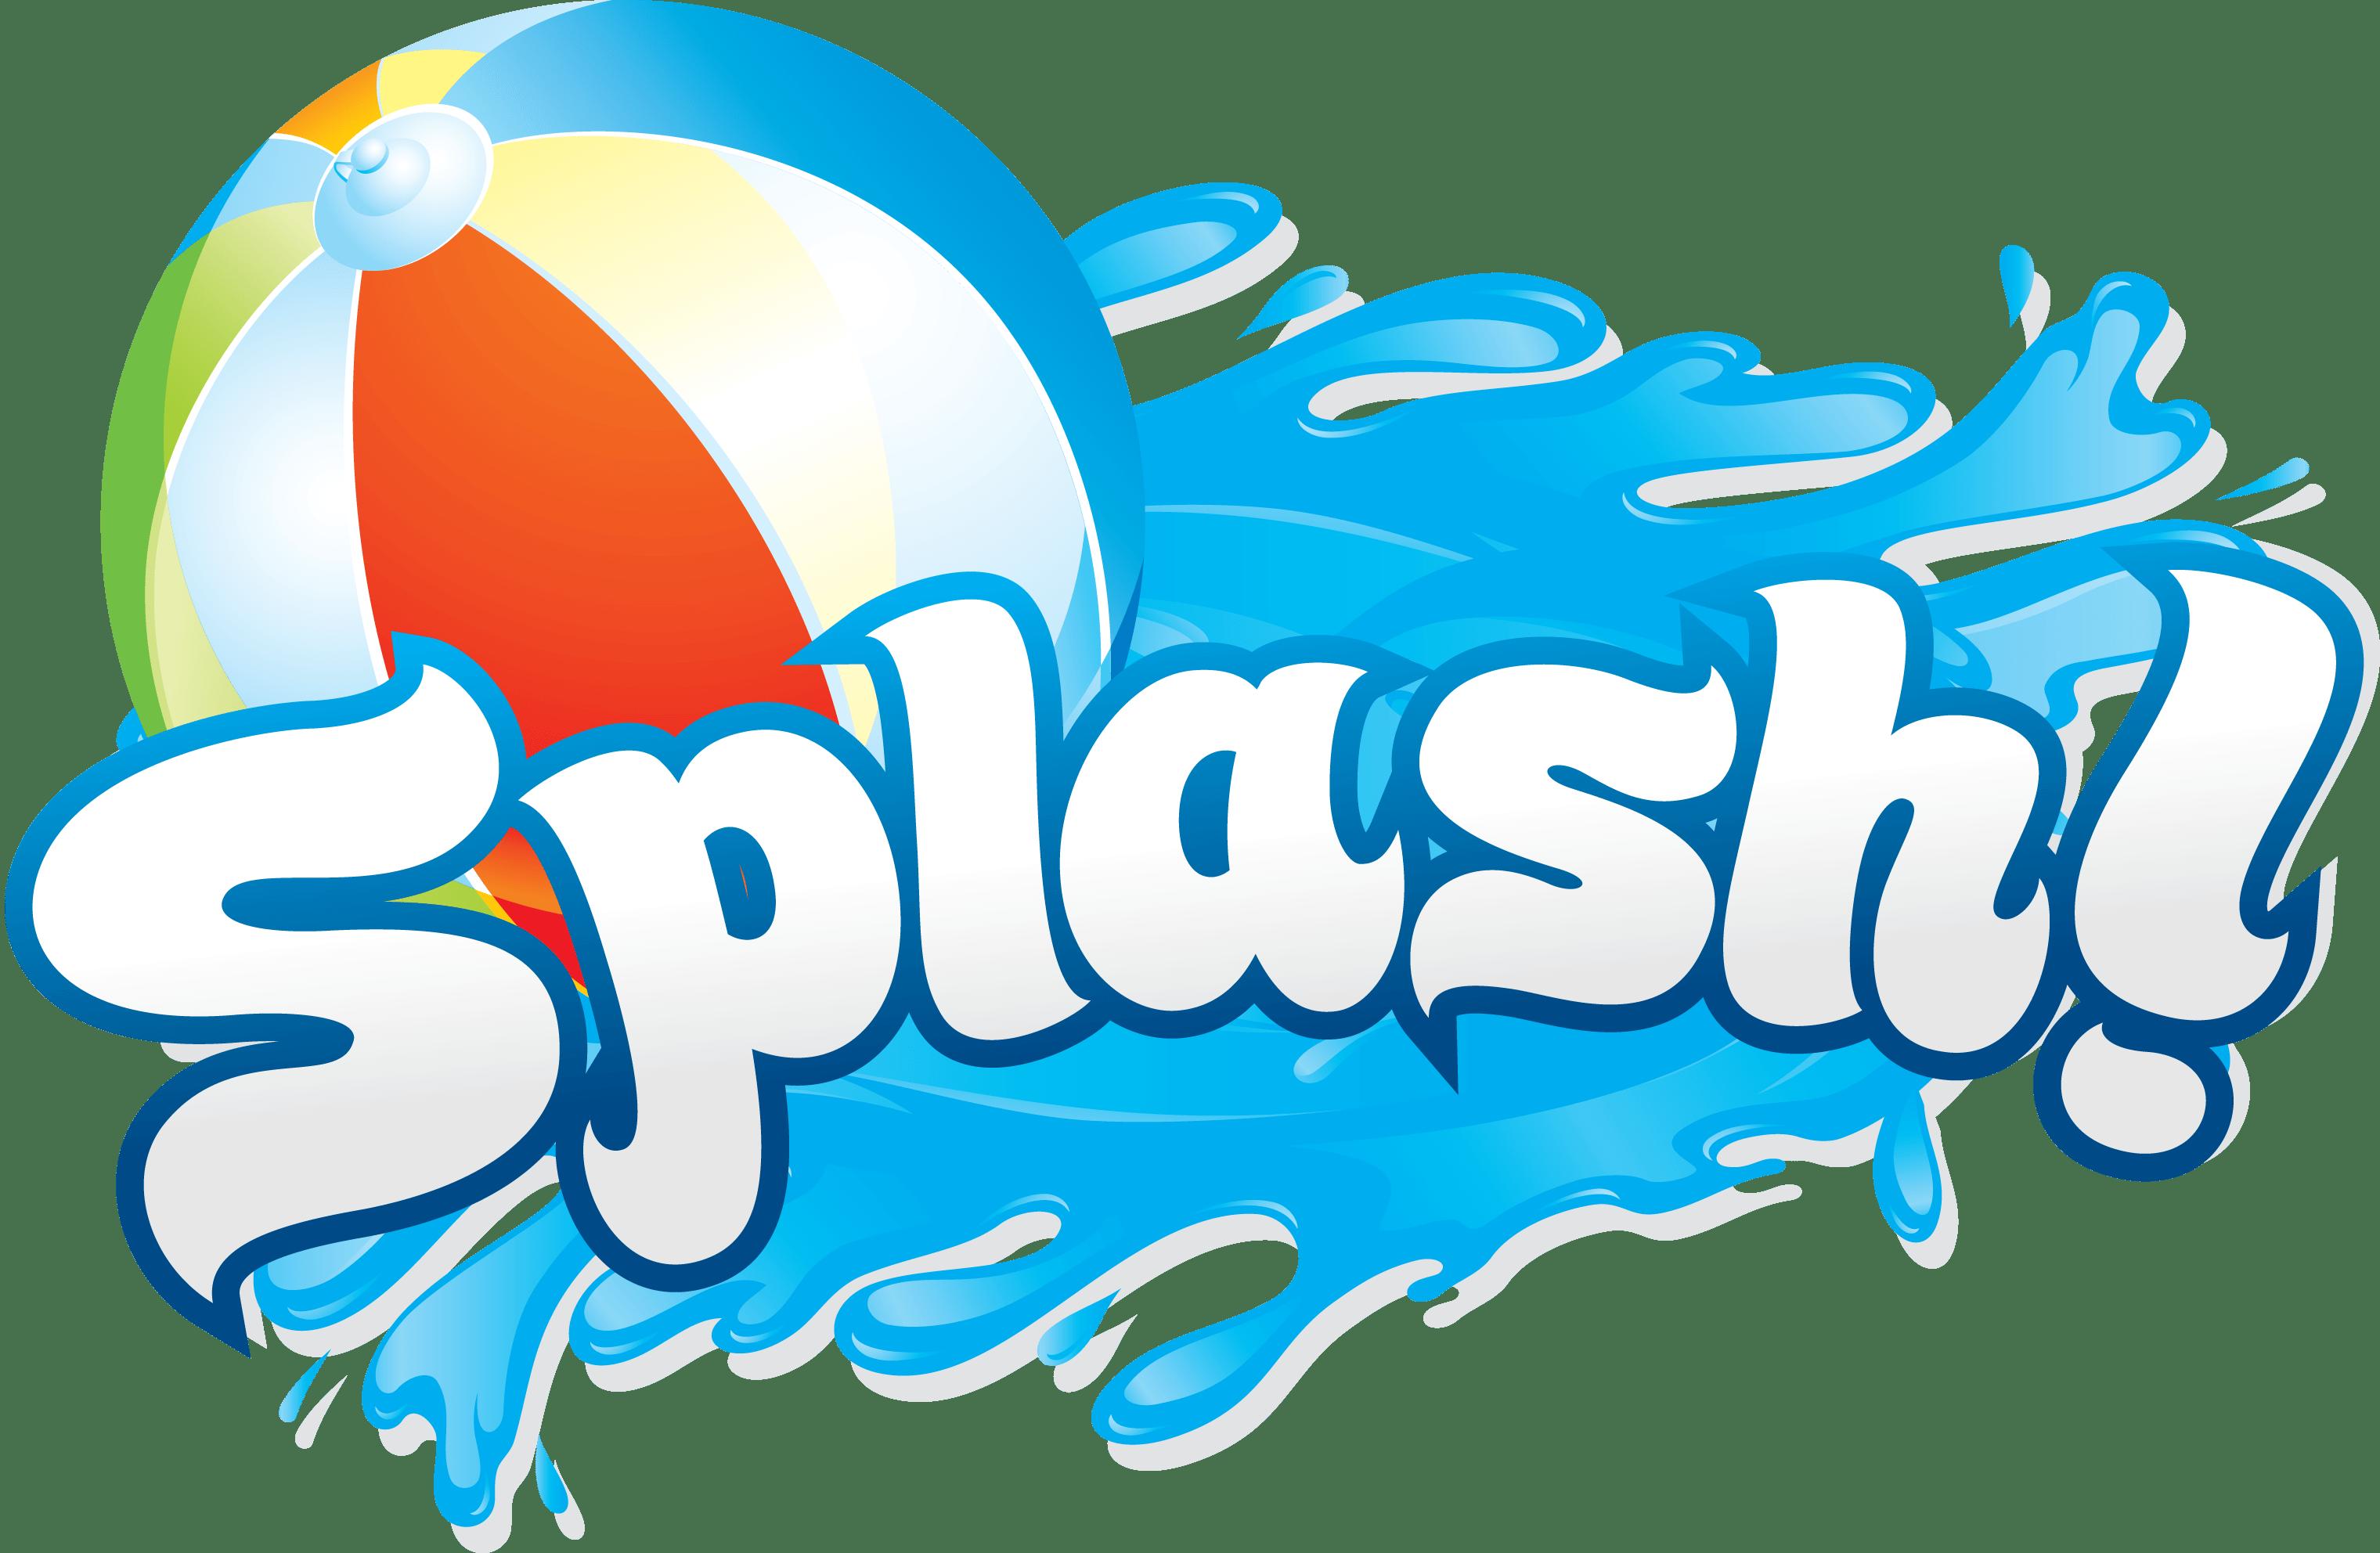 Swimming in money clipart png free Borde de Clip Clip de Pool Splash | Pool party | Pinterest | Clip ... png free